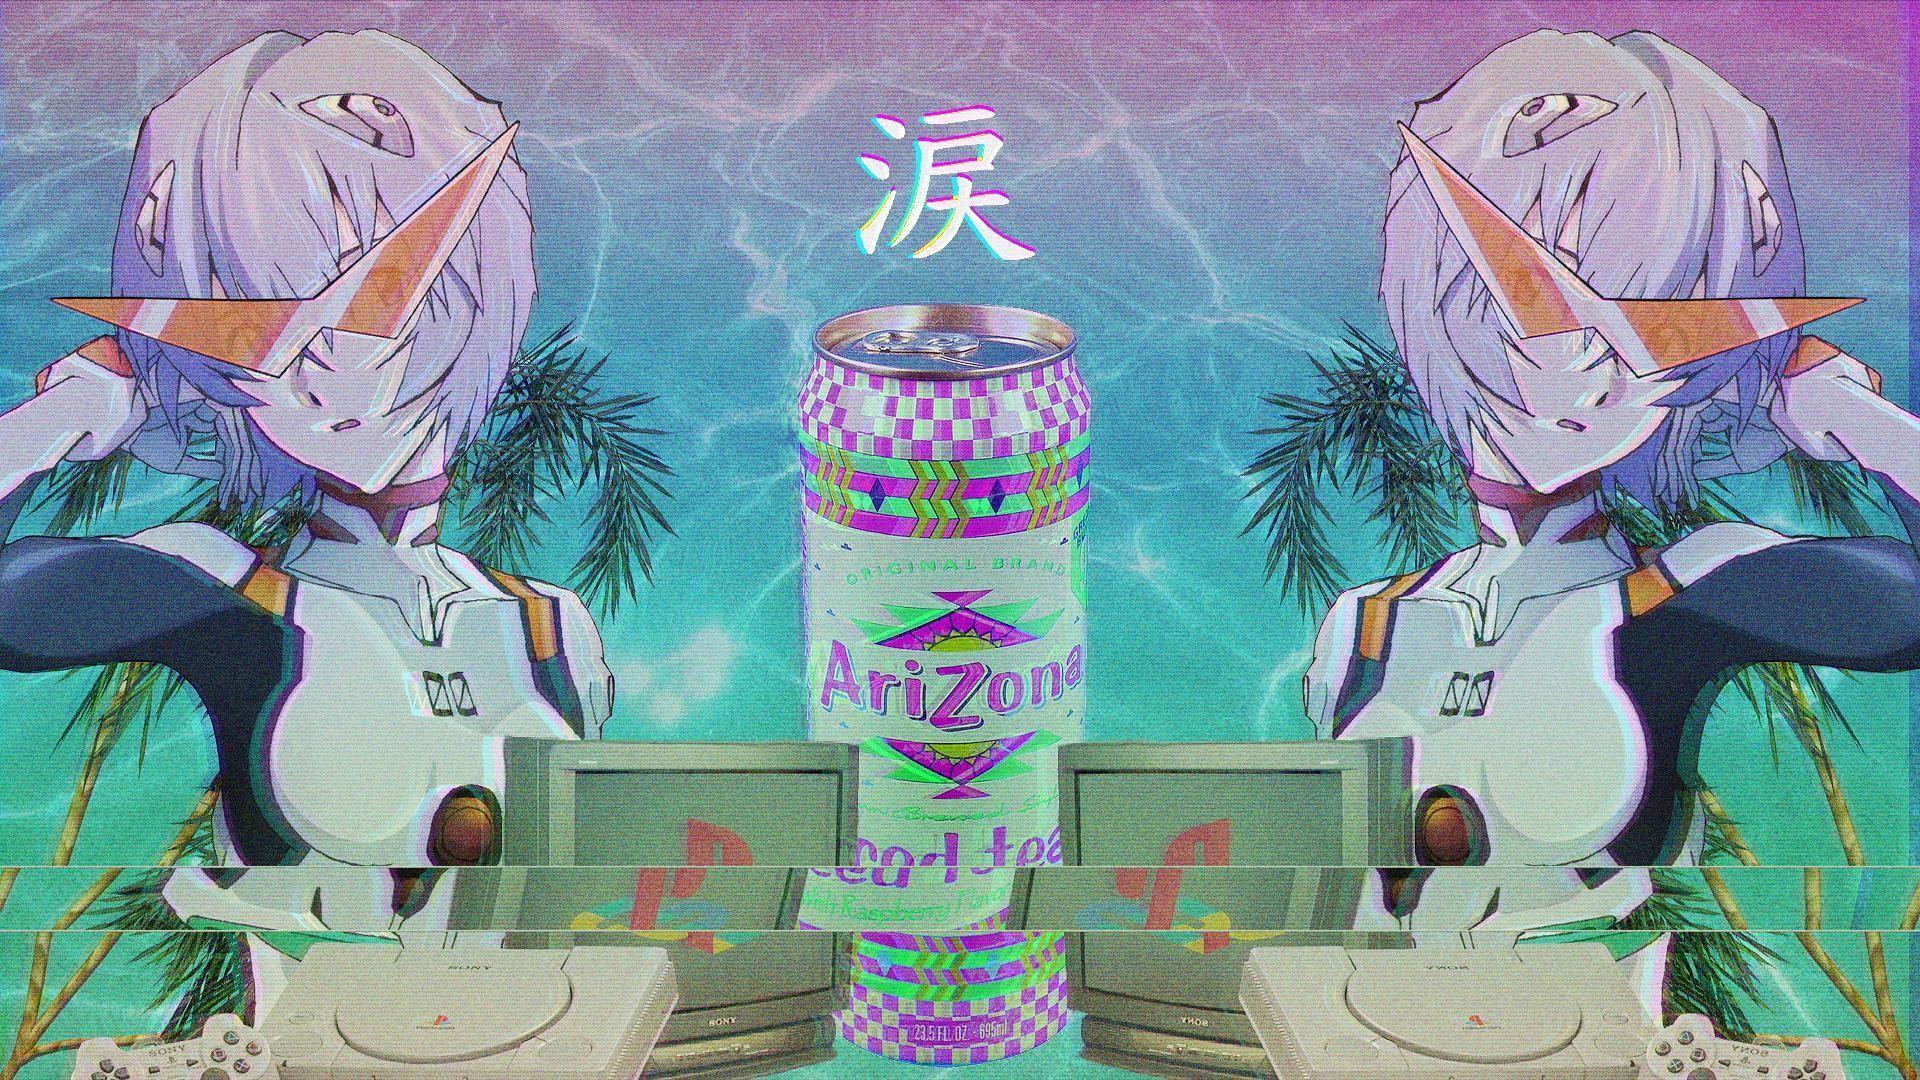 Anime Vaporwave Desktop Wallpapers Top Free Anime Vaporwave Desktop Backgrounds Wallpaperaccess